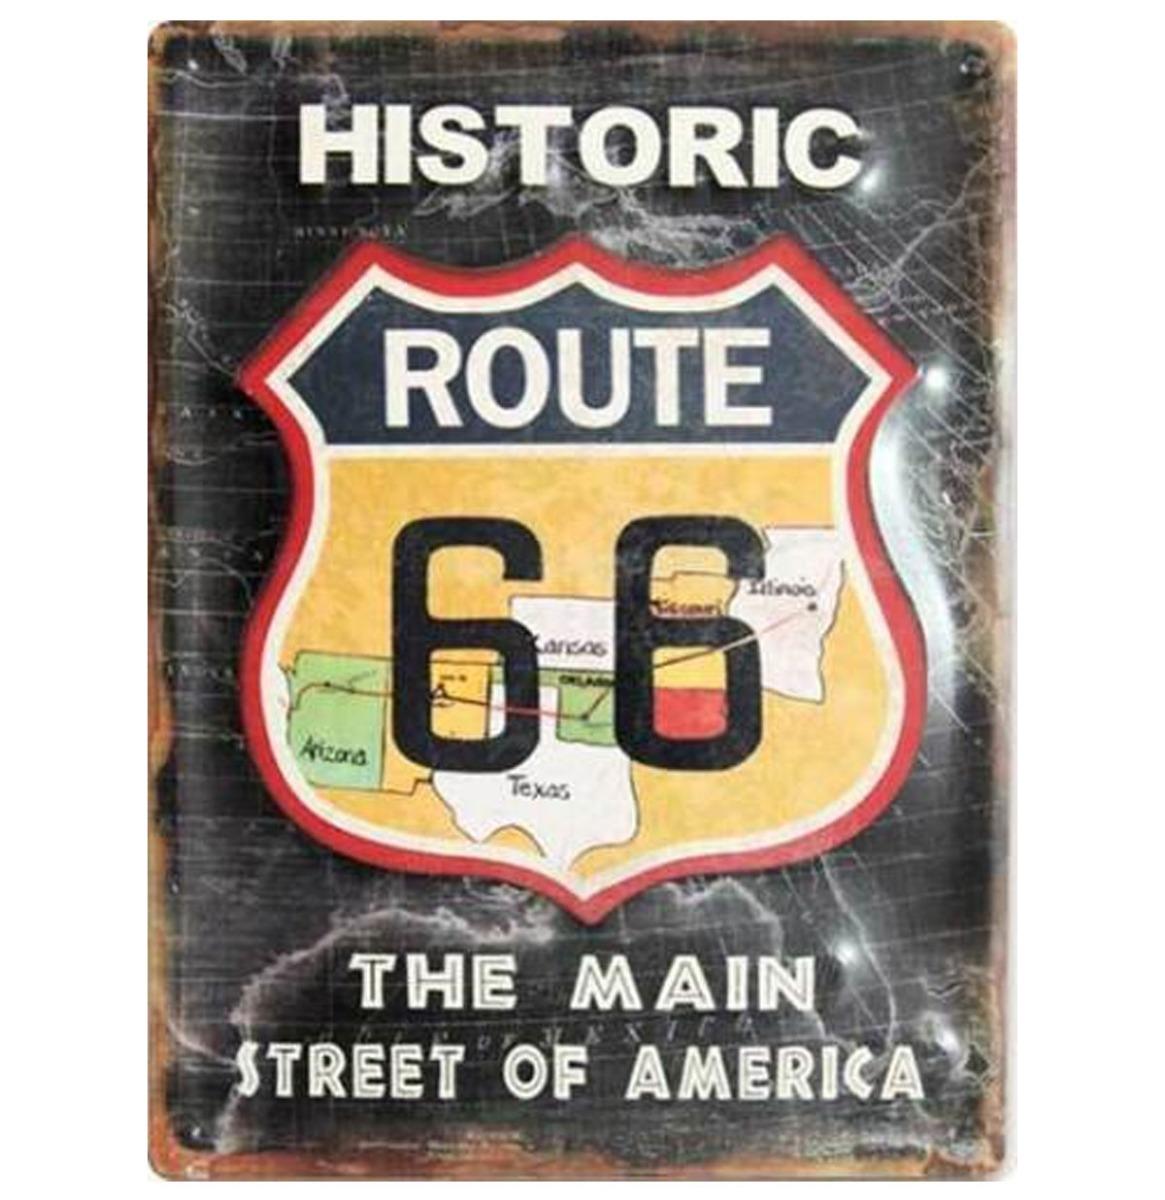 Historic Route 66 Main Street Of America Stalen Bord Met Relief 30 x 40 cm